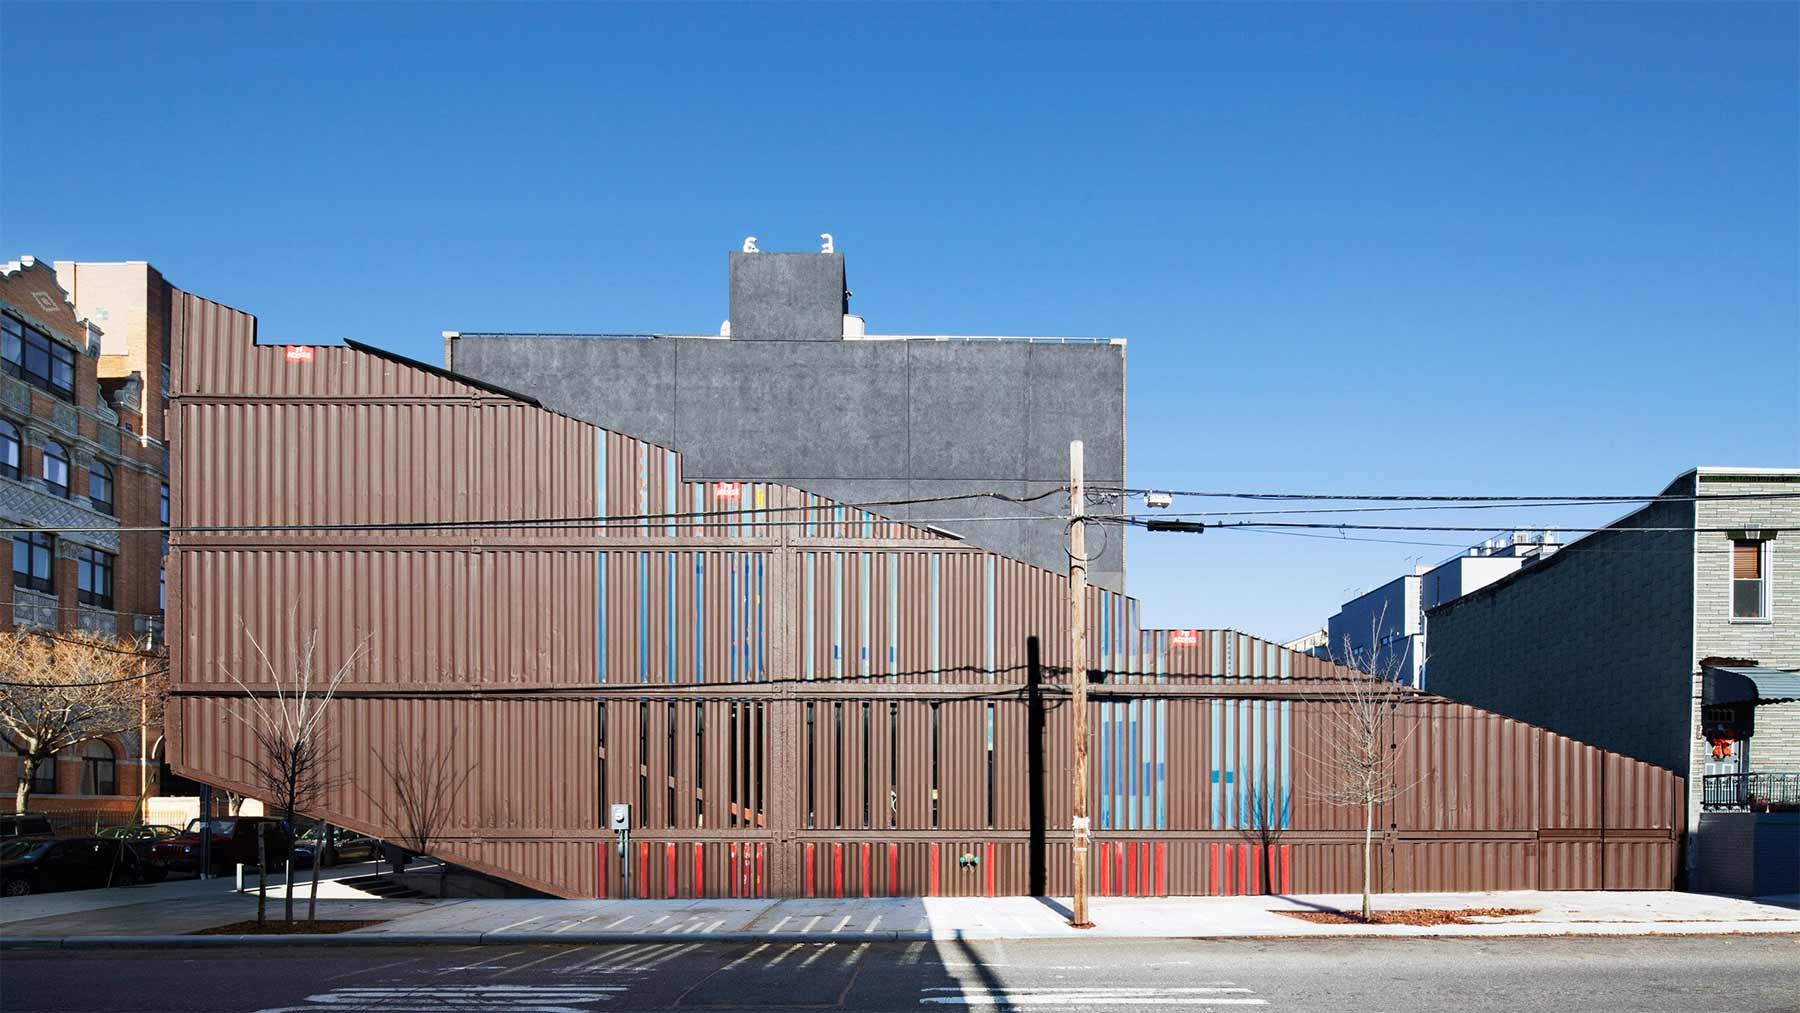 Haus aus 21 verschnittenen Containern carroll-house-21-Container_02